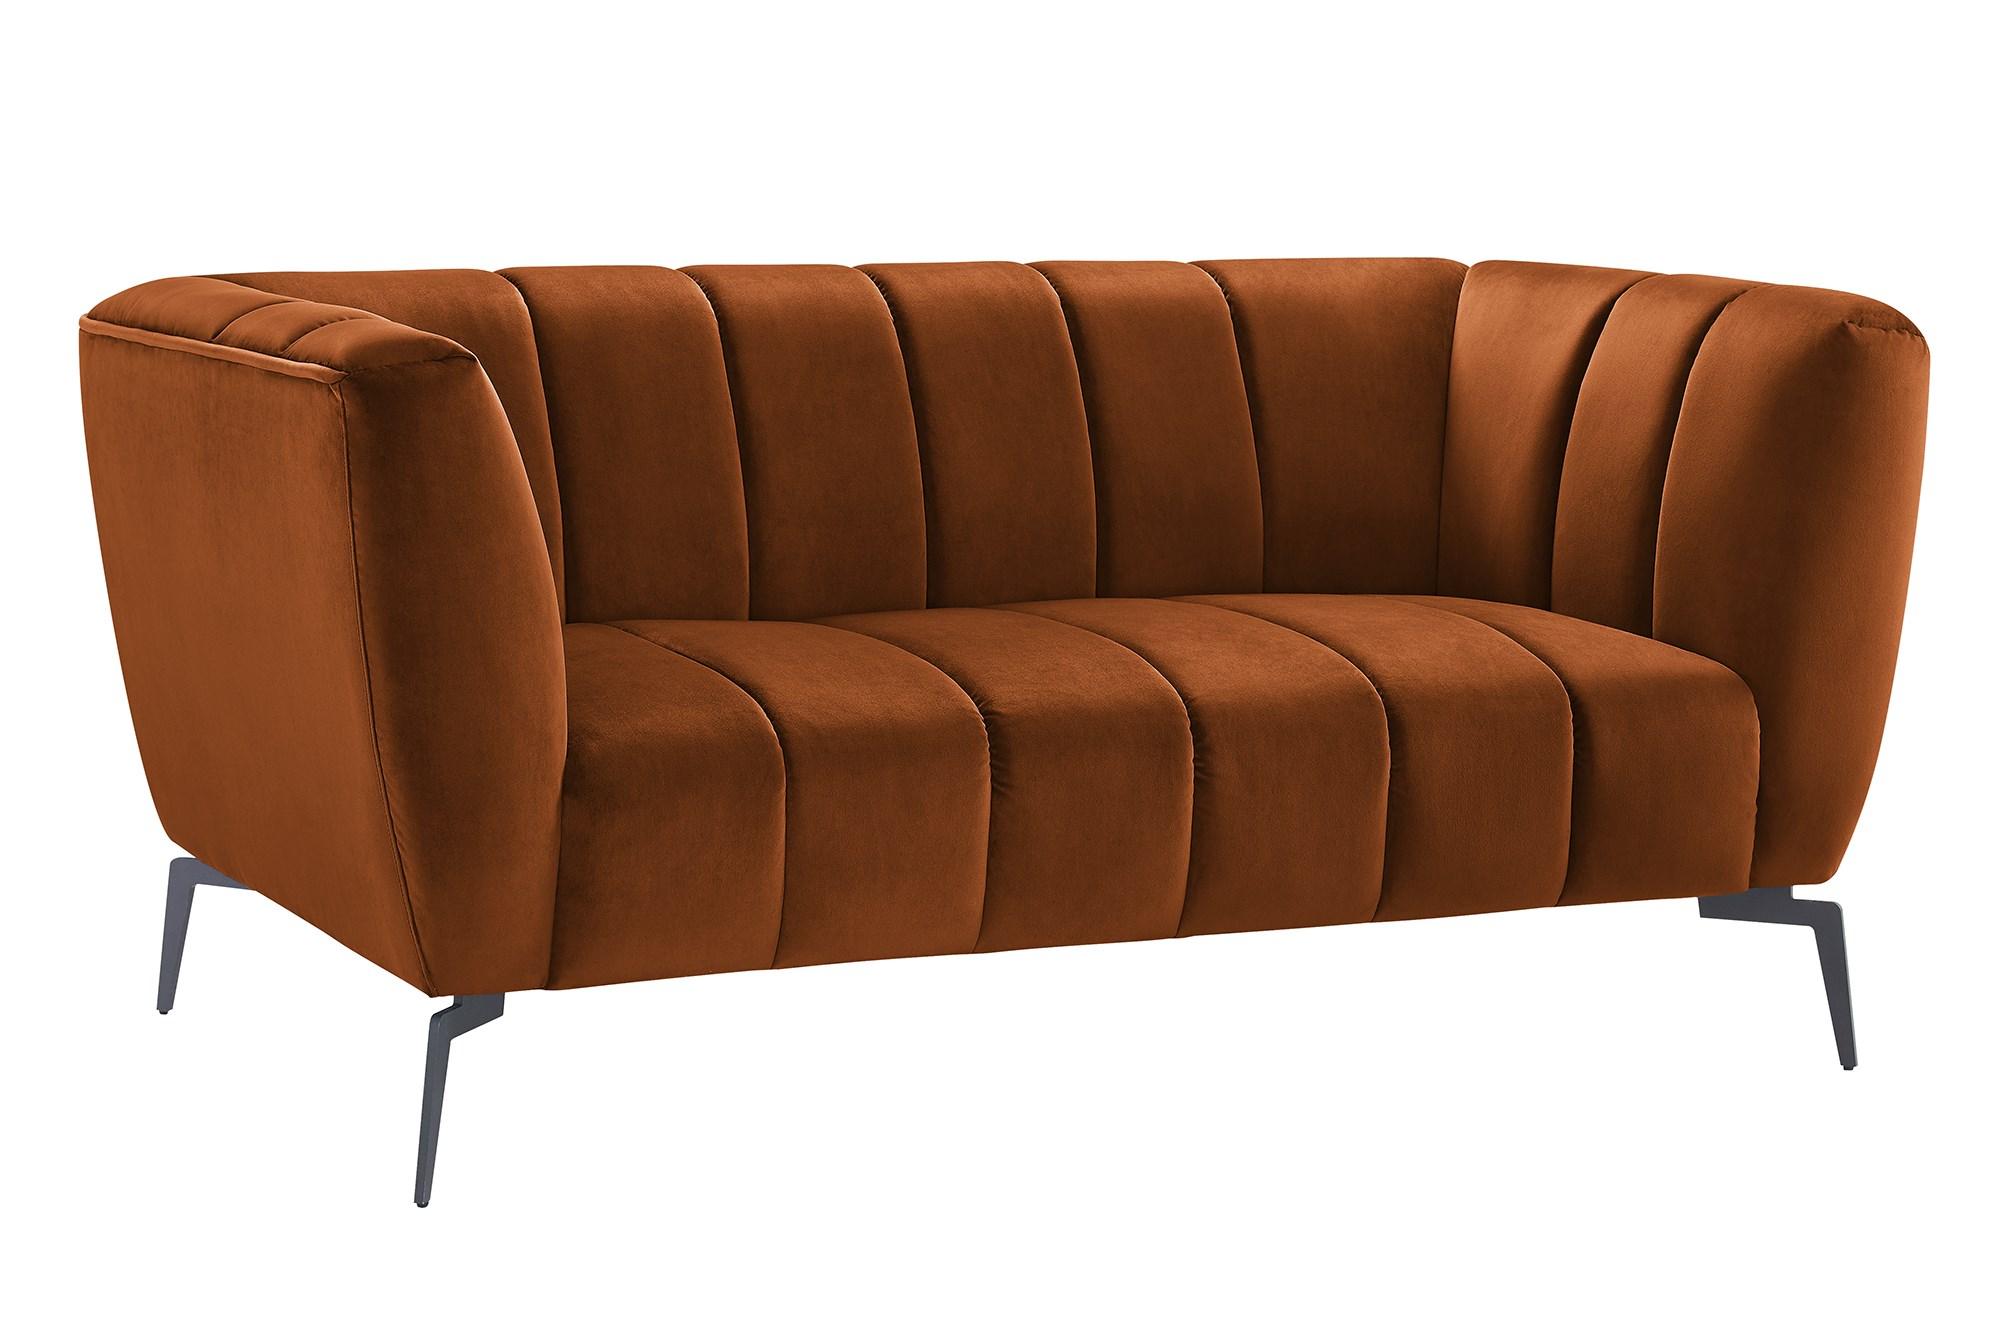 Pavia 2 Personers Sofa I Bronzefarvet Stof Med Sorte Metalben